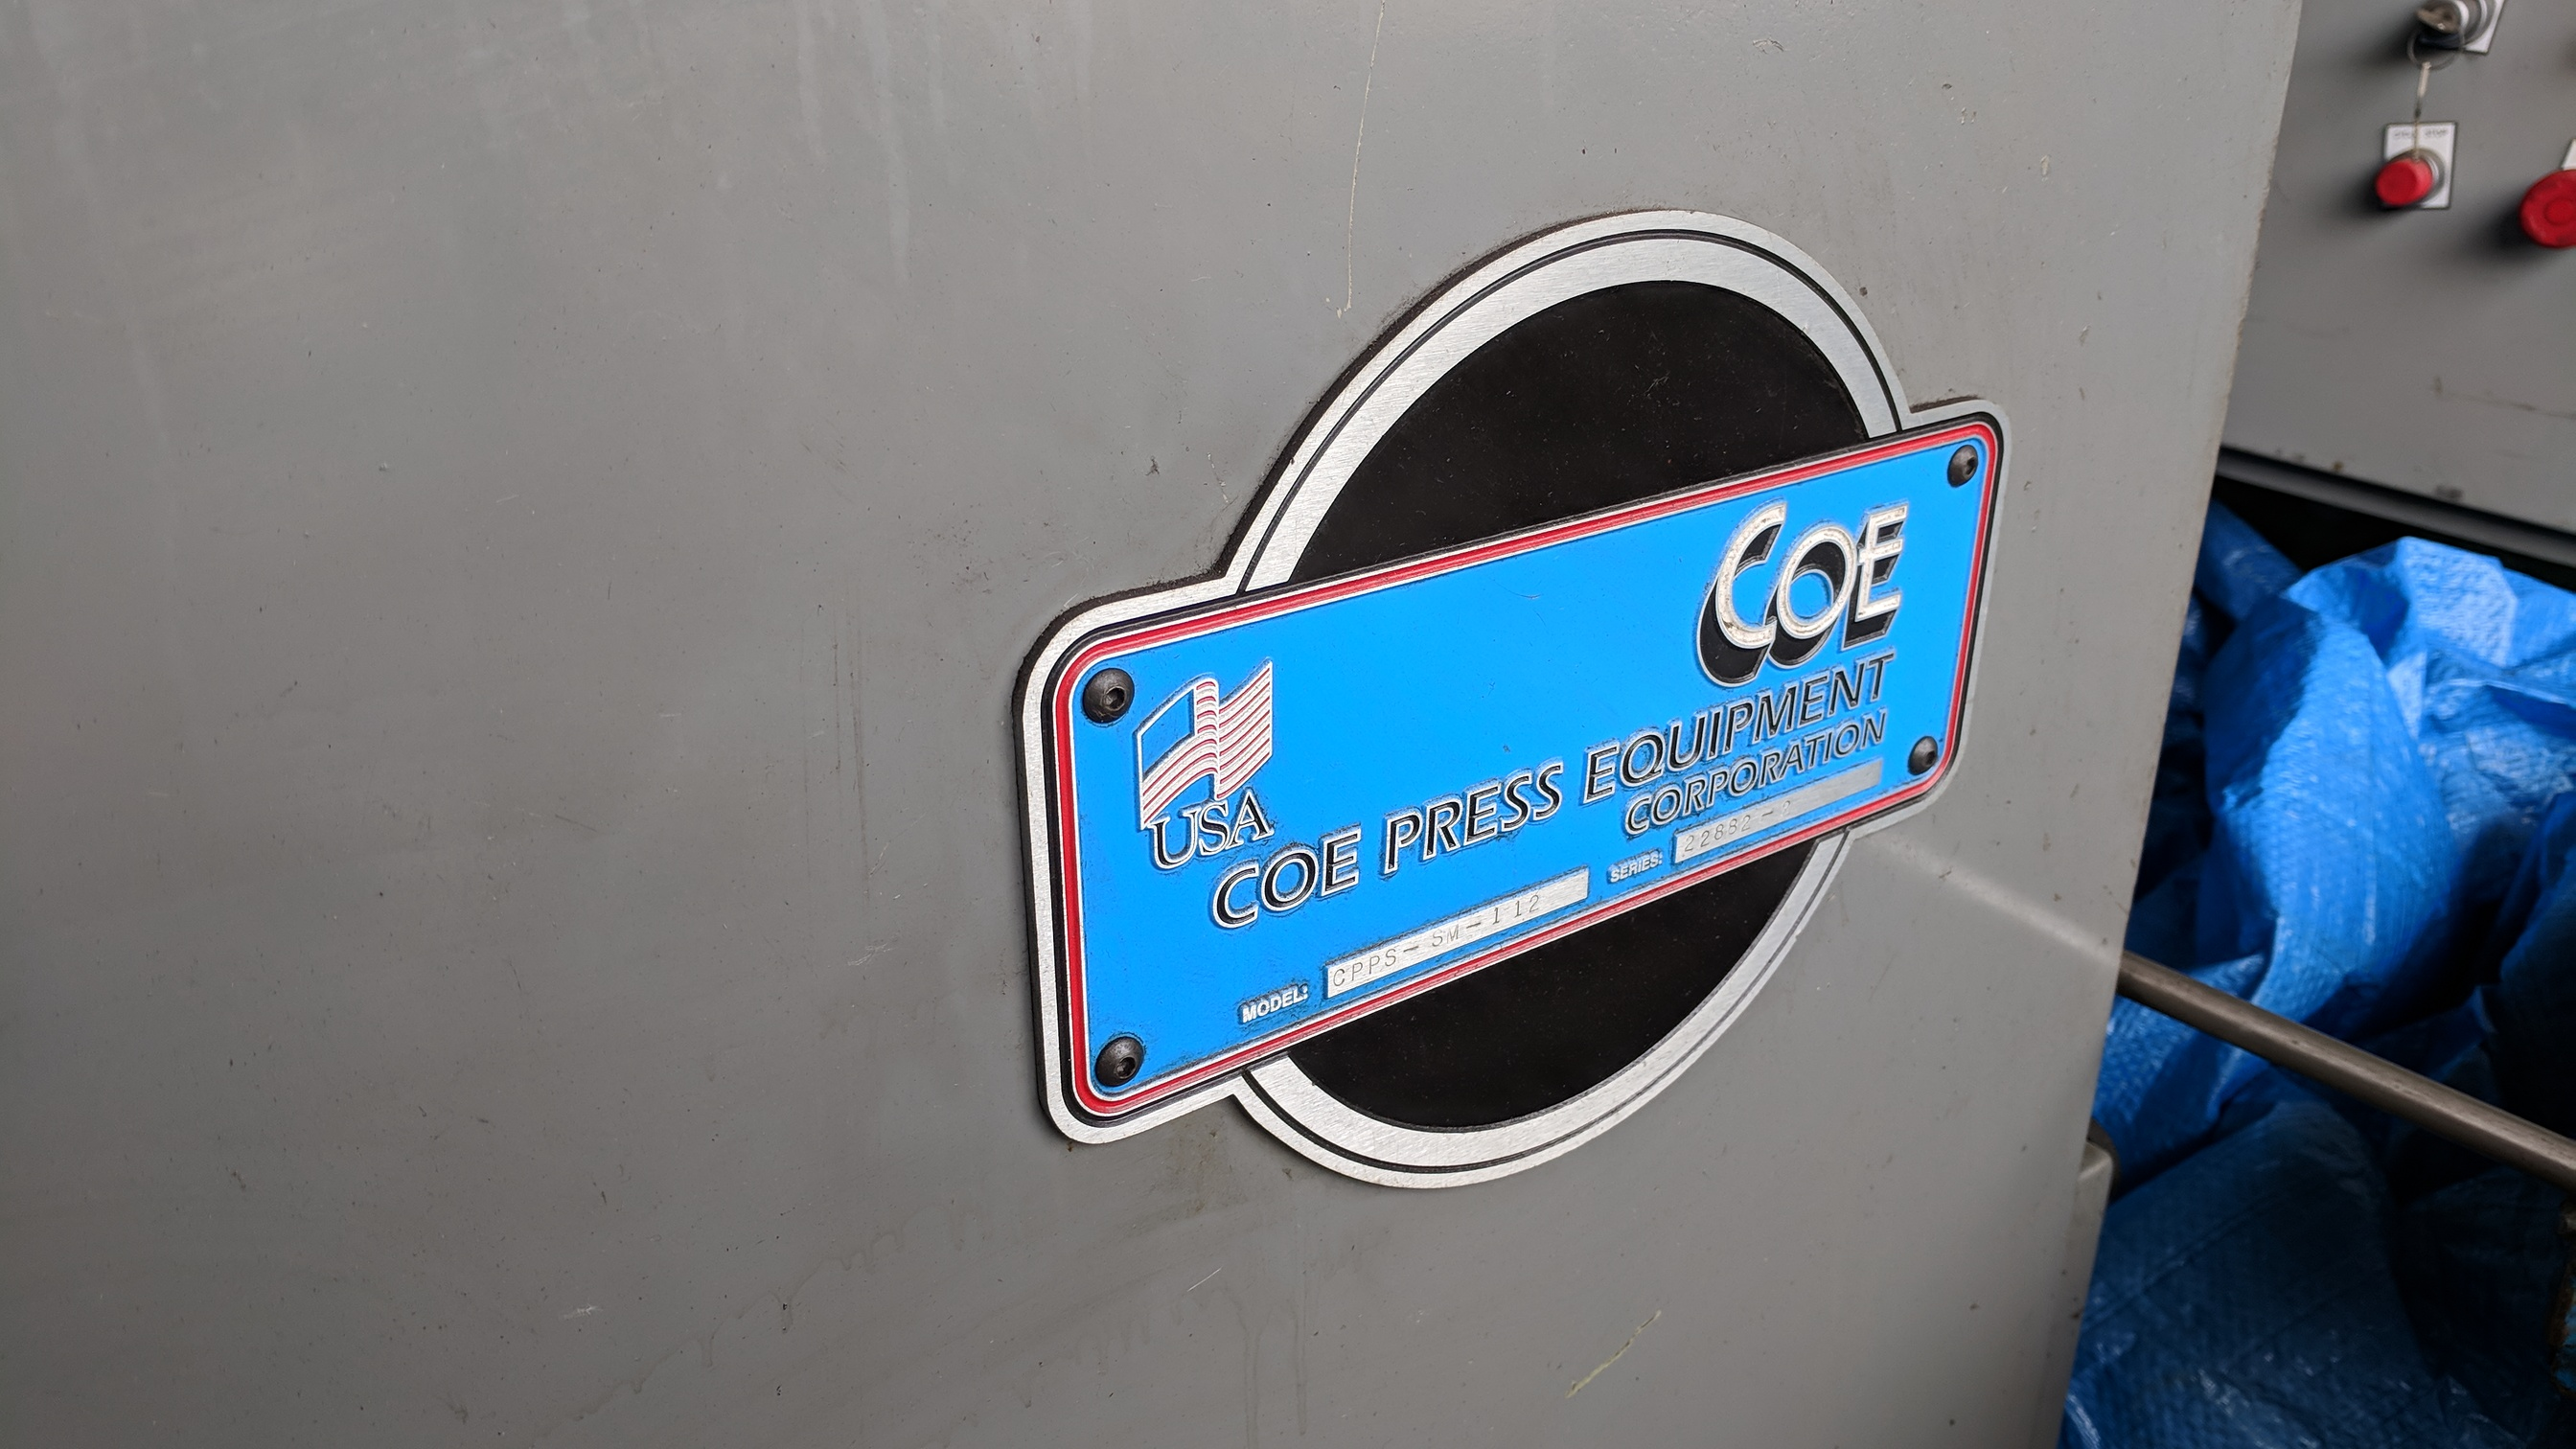 "COE PRESS EQUIPMENT CPPS-SM-112 .125""X12"" STRAIGHTENER-FEEDER, S/N 22882 (CI) - Image 2 of 3"